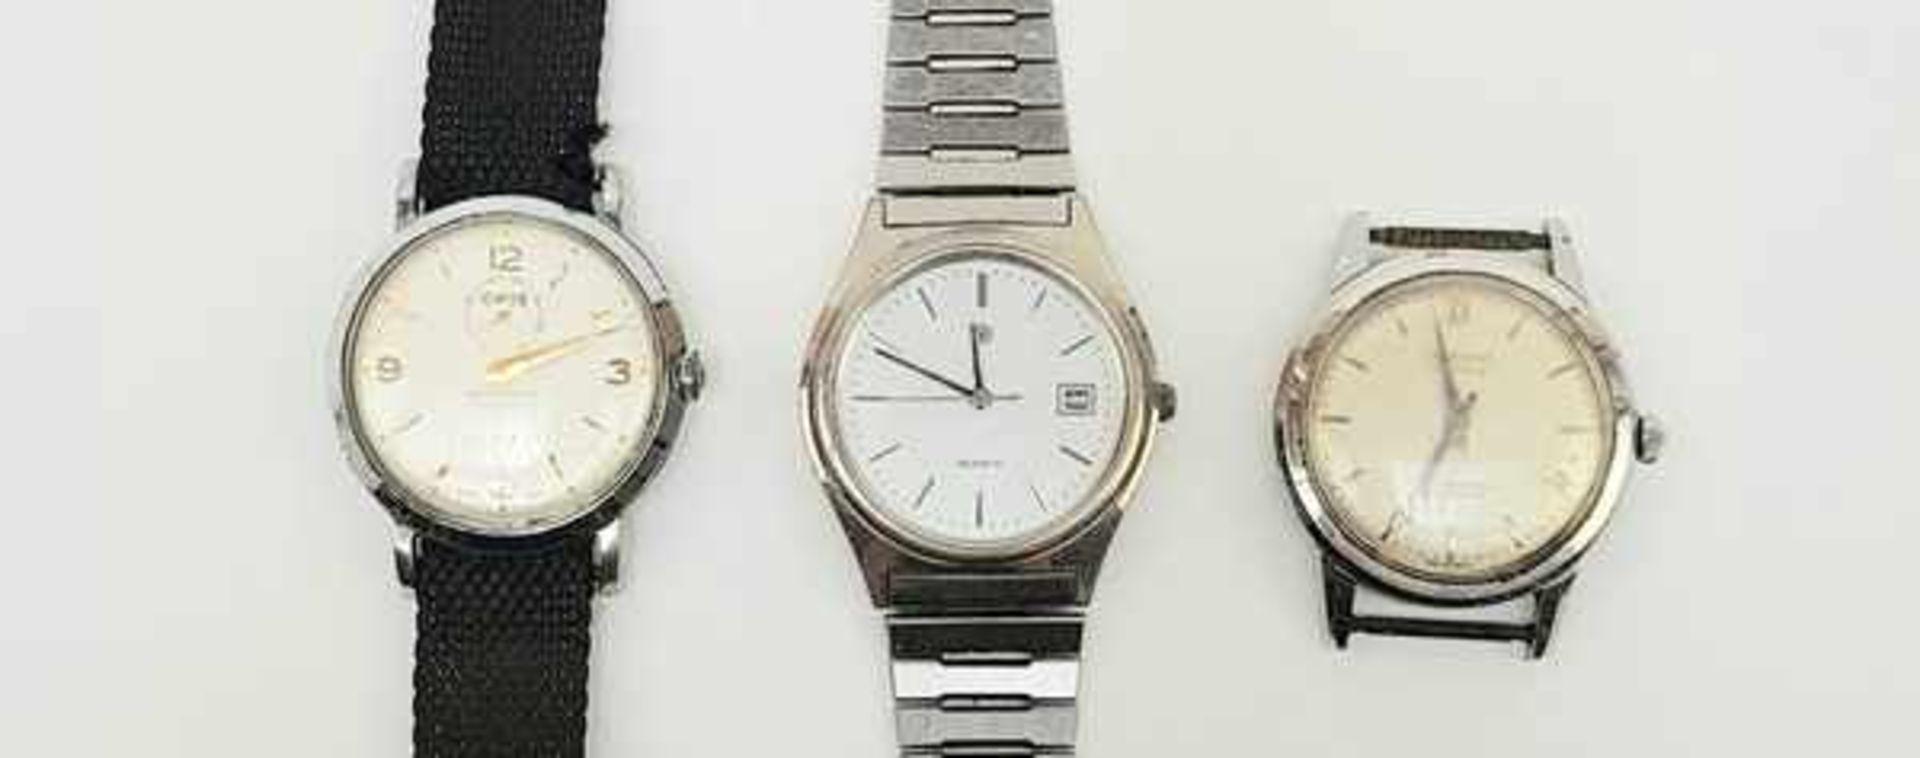 (Sieraden) Horloges Oris - Image 3 of 3